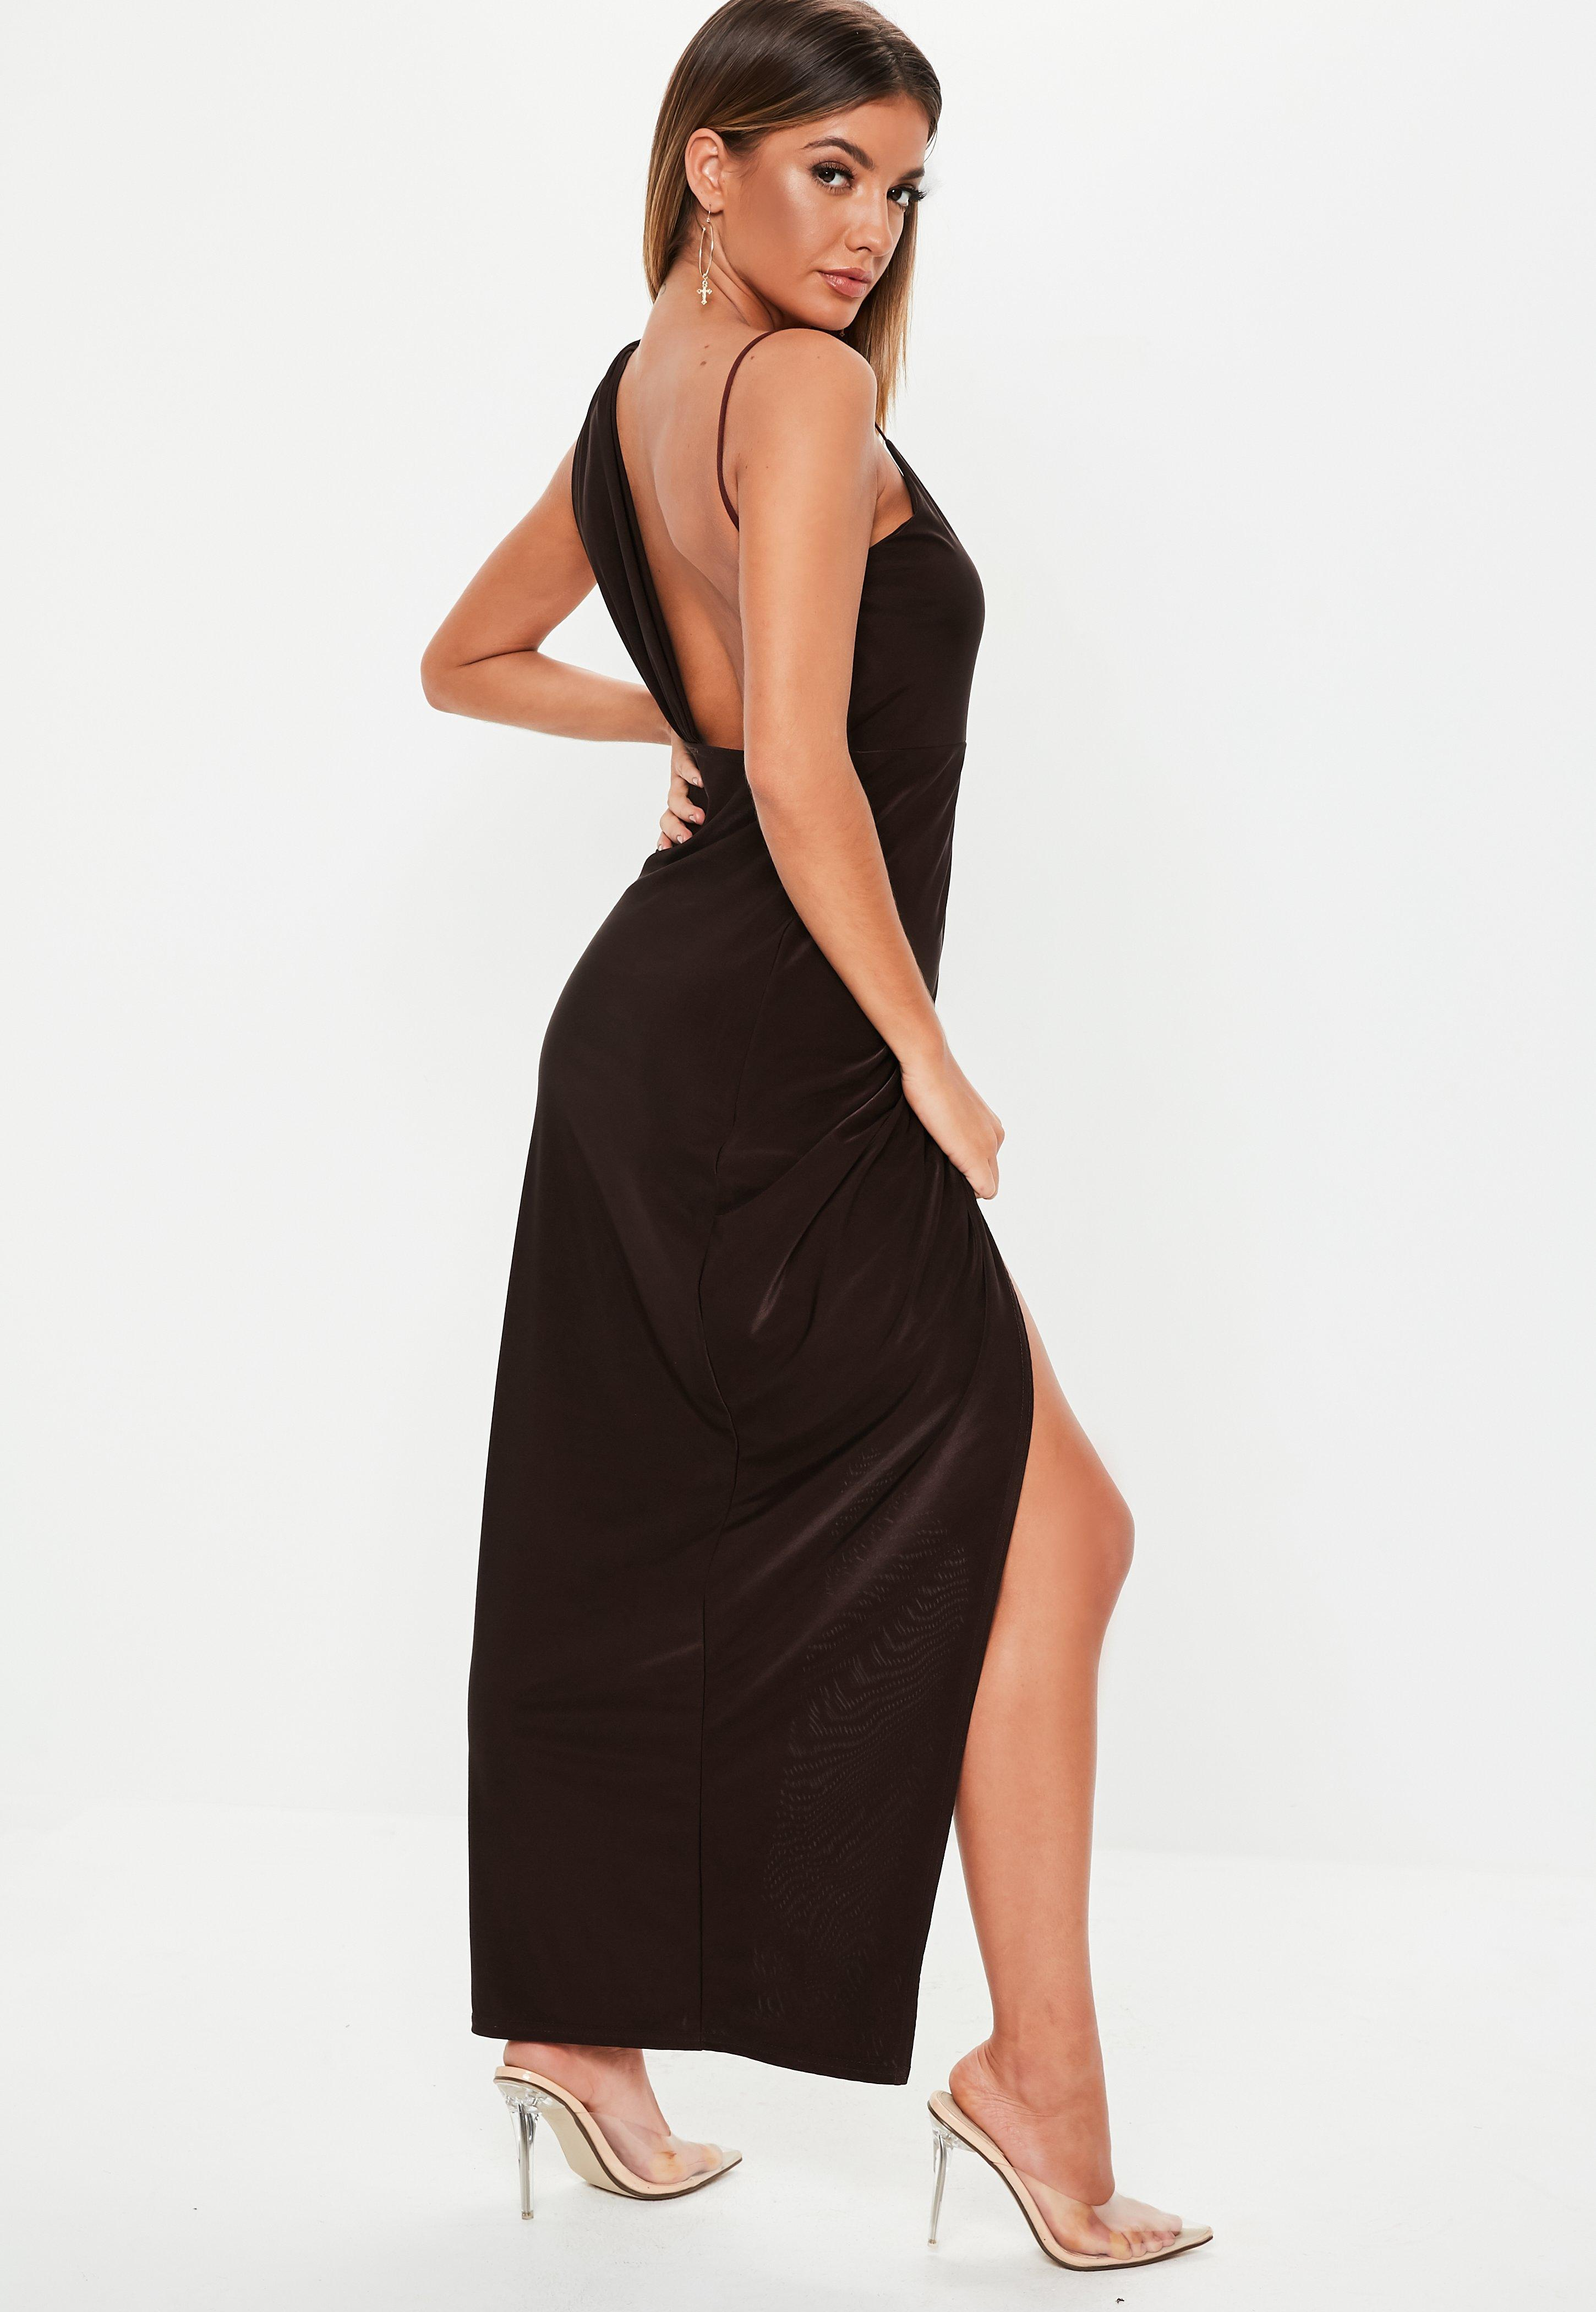 f07da5869e0b Missguided - Chocolate Brown Slinky Asymmetric Maxi Dress - Lyst. View  fullscreen